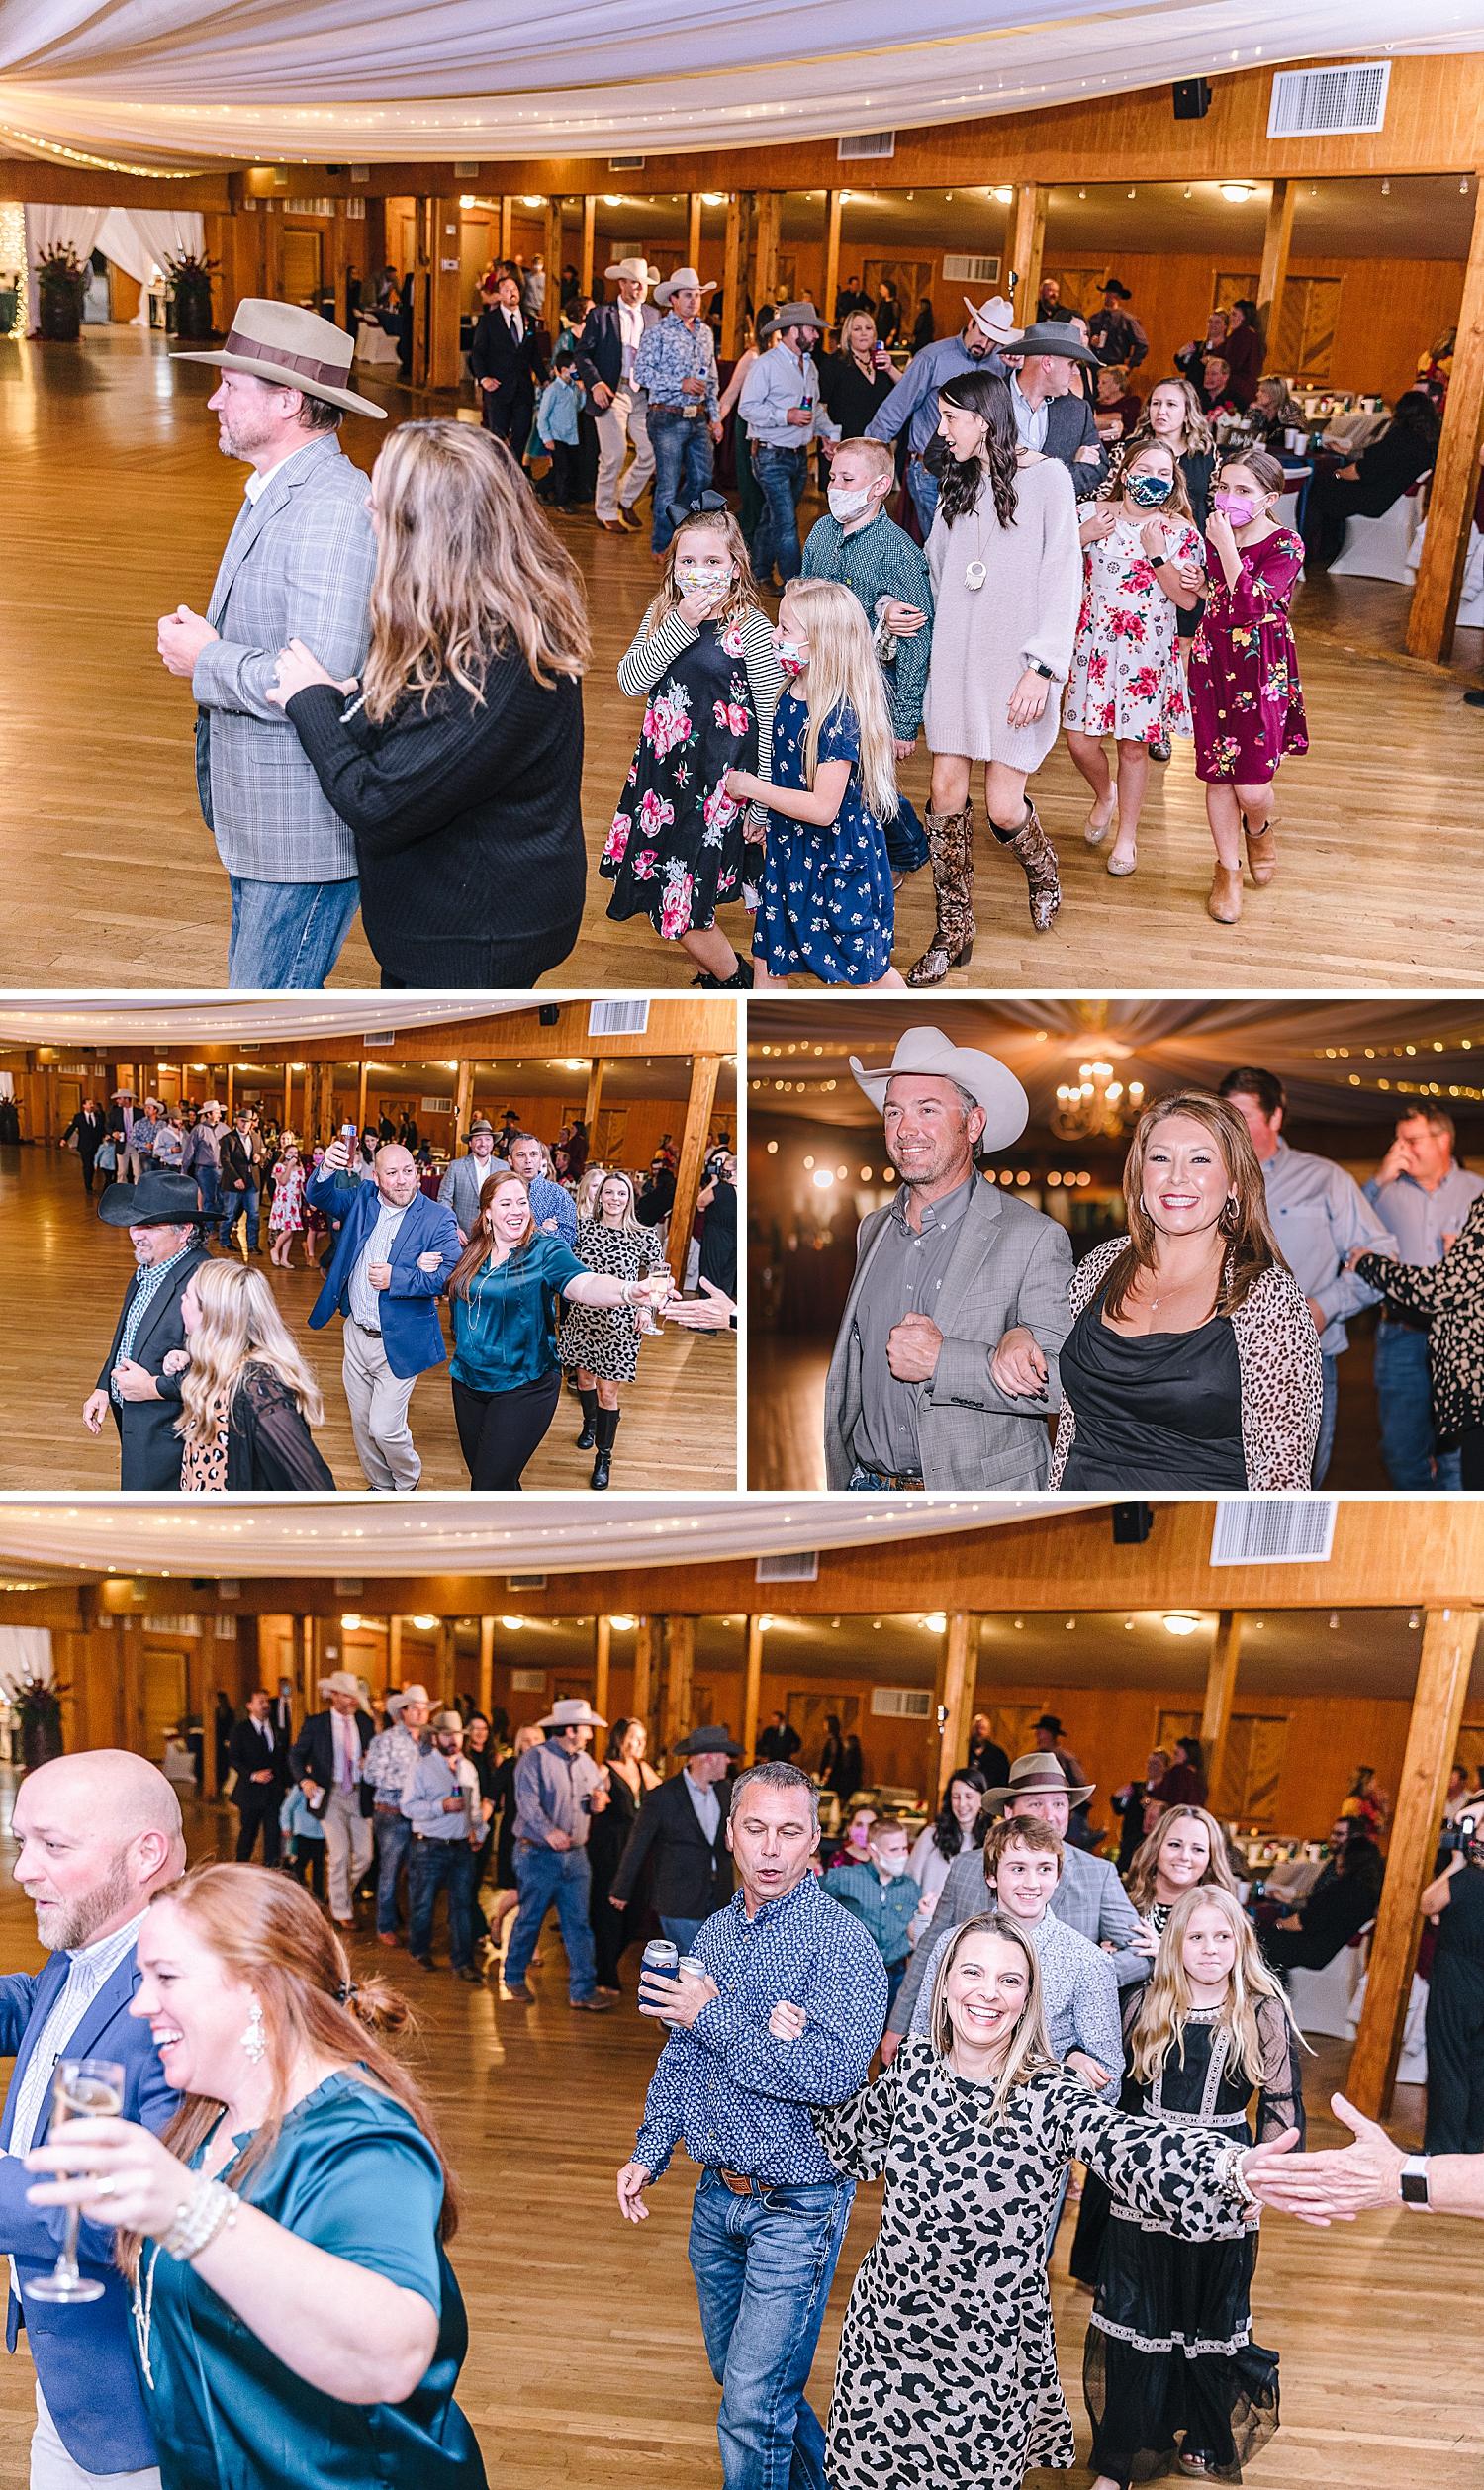 Jewel-Tone-Texas-Wedding-Valerie-Jason-Carly-Barton-Photography_0090.jpg